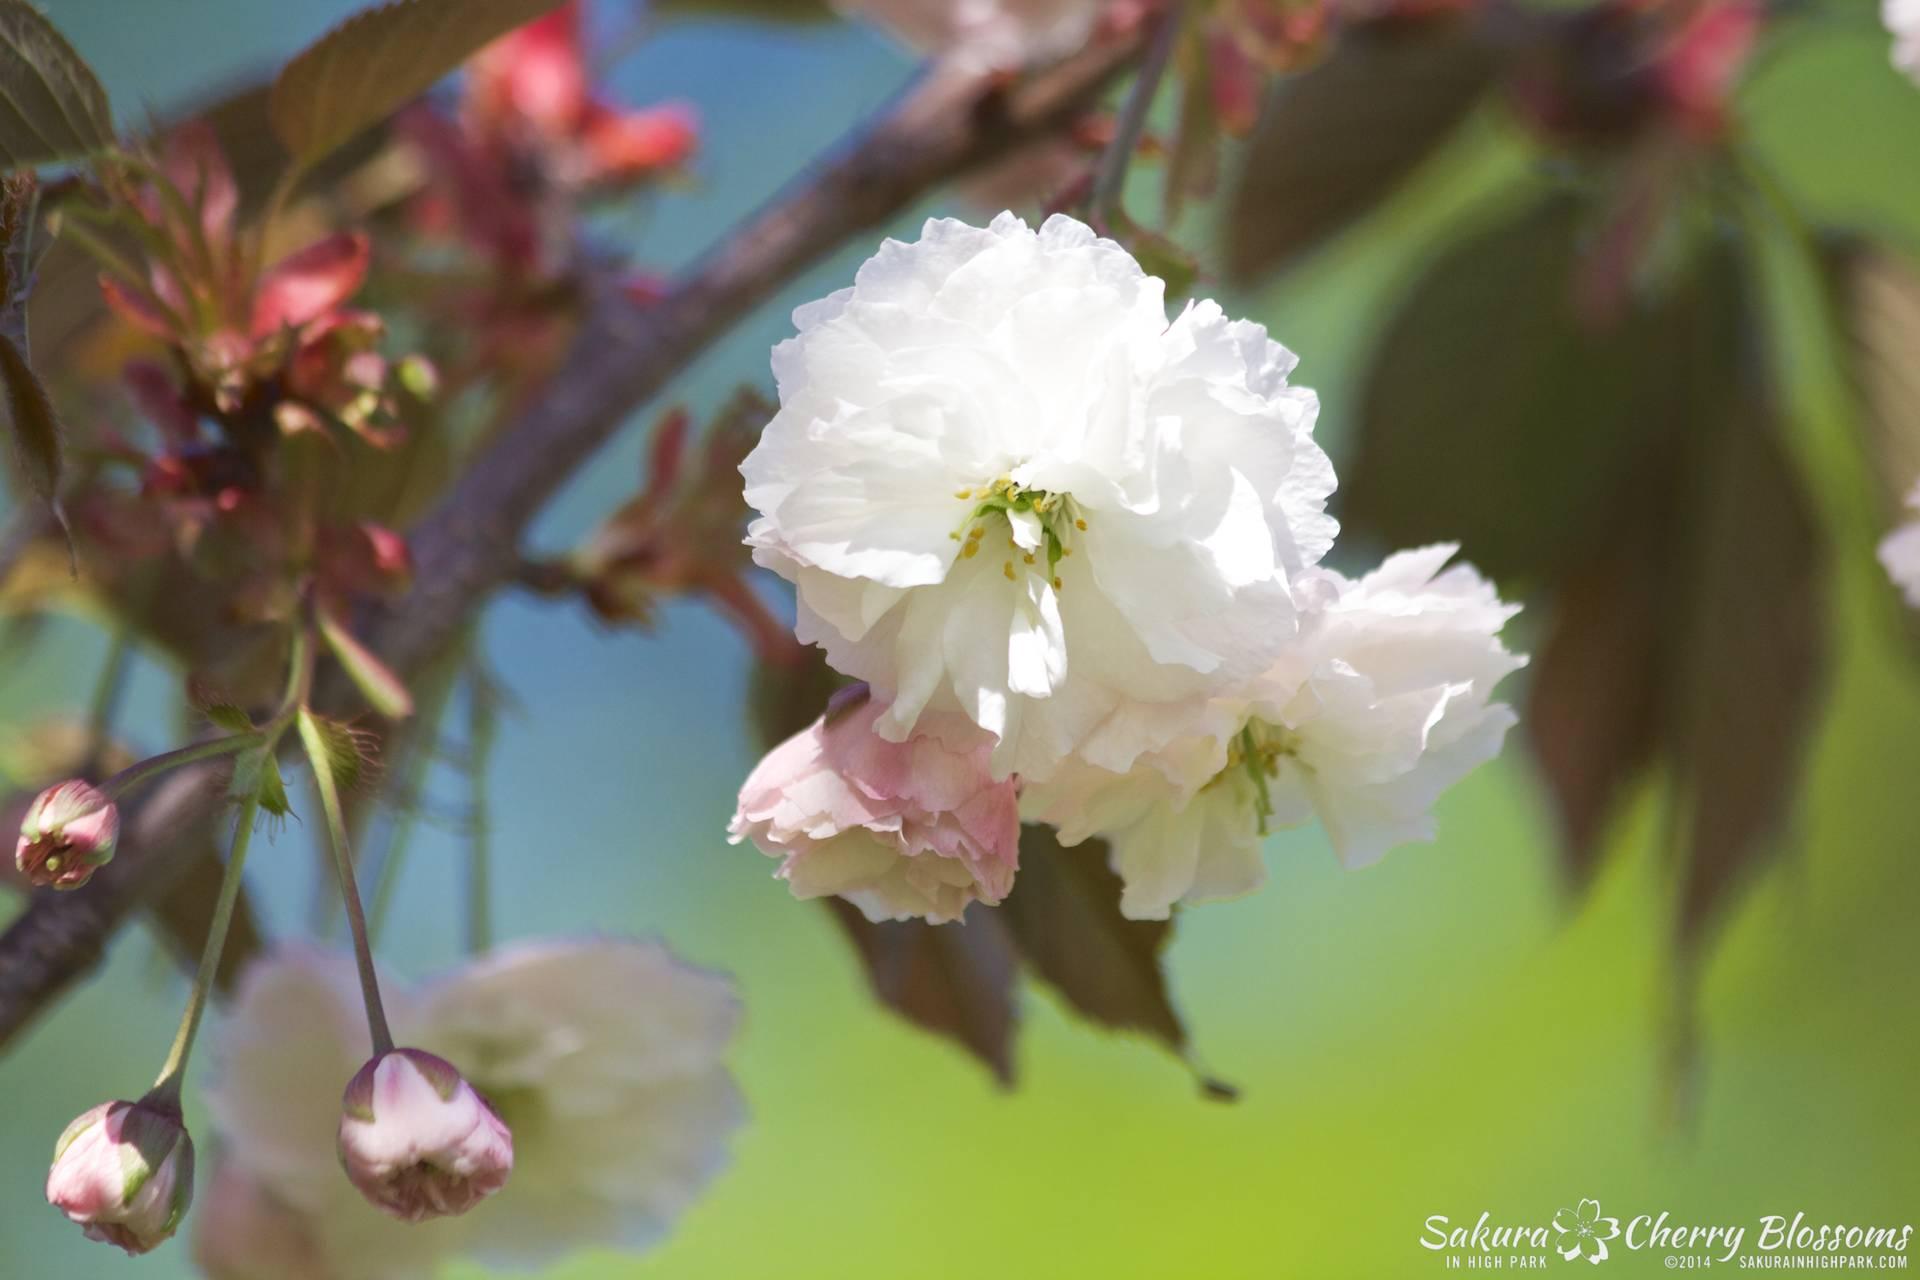 SakuraInHighPark-May2414-472.jpg